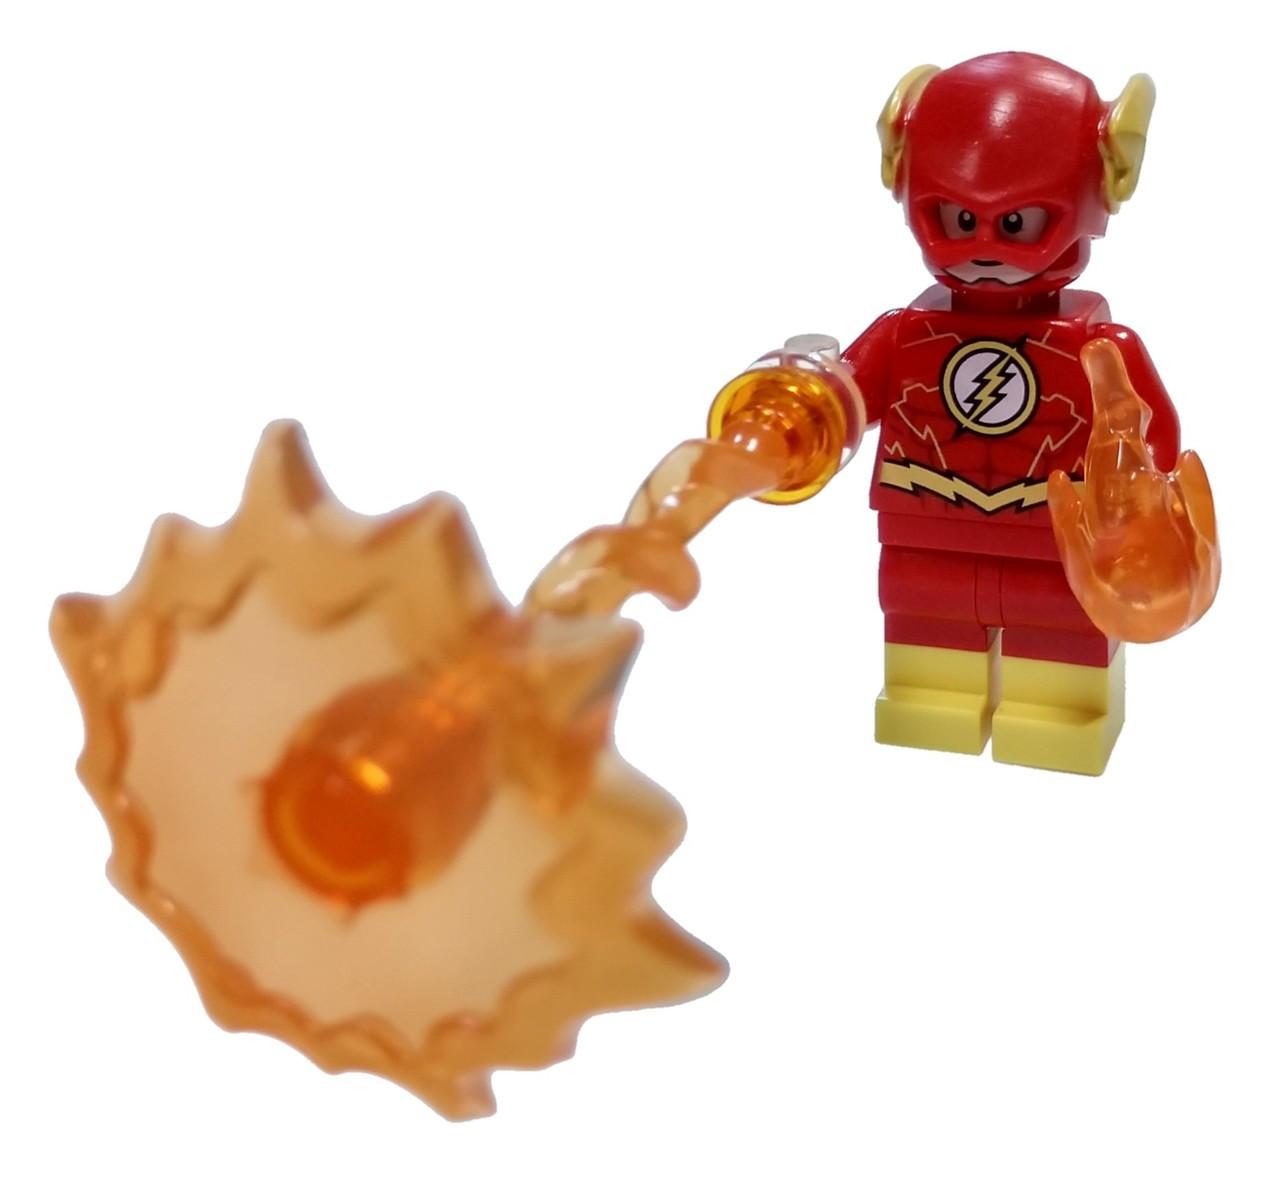 Lego Dc Super Heroes Batman Ii The Flash Minifigure Yellow Boots And